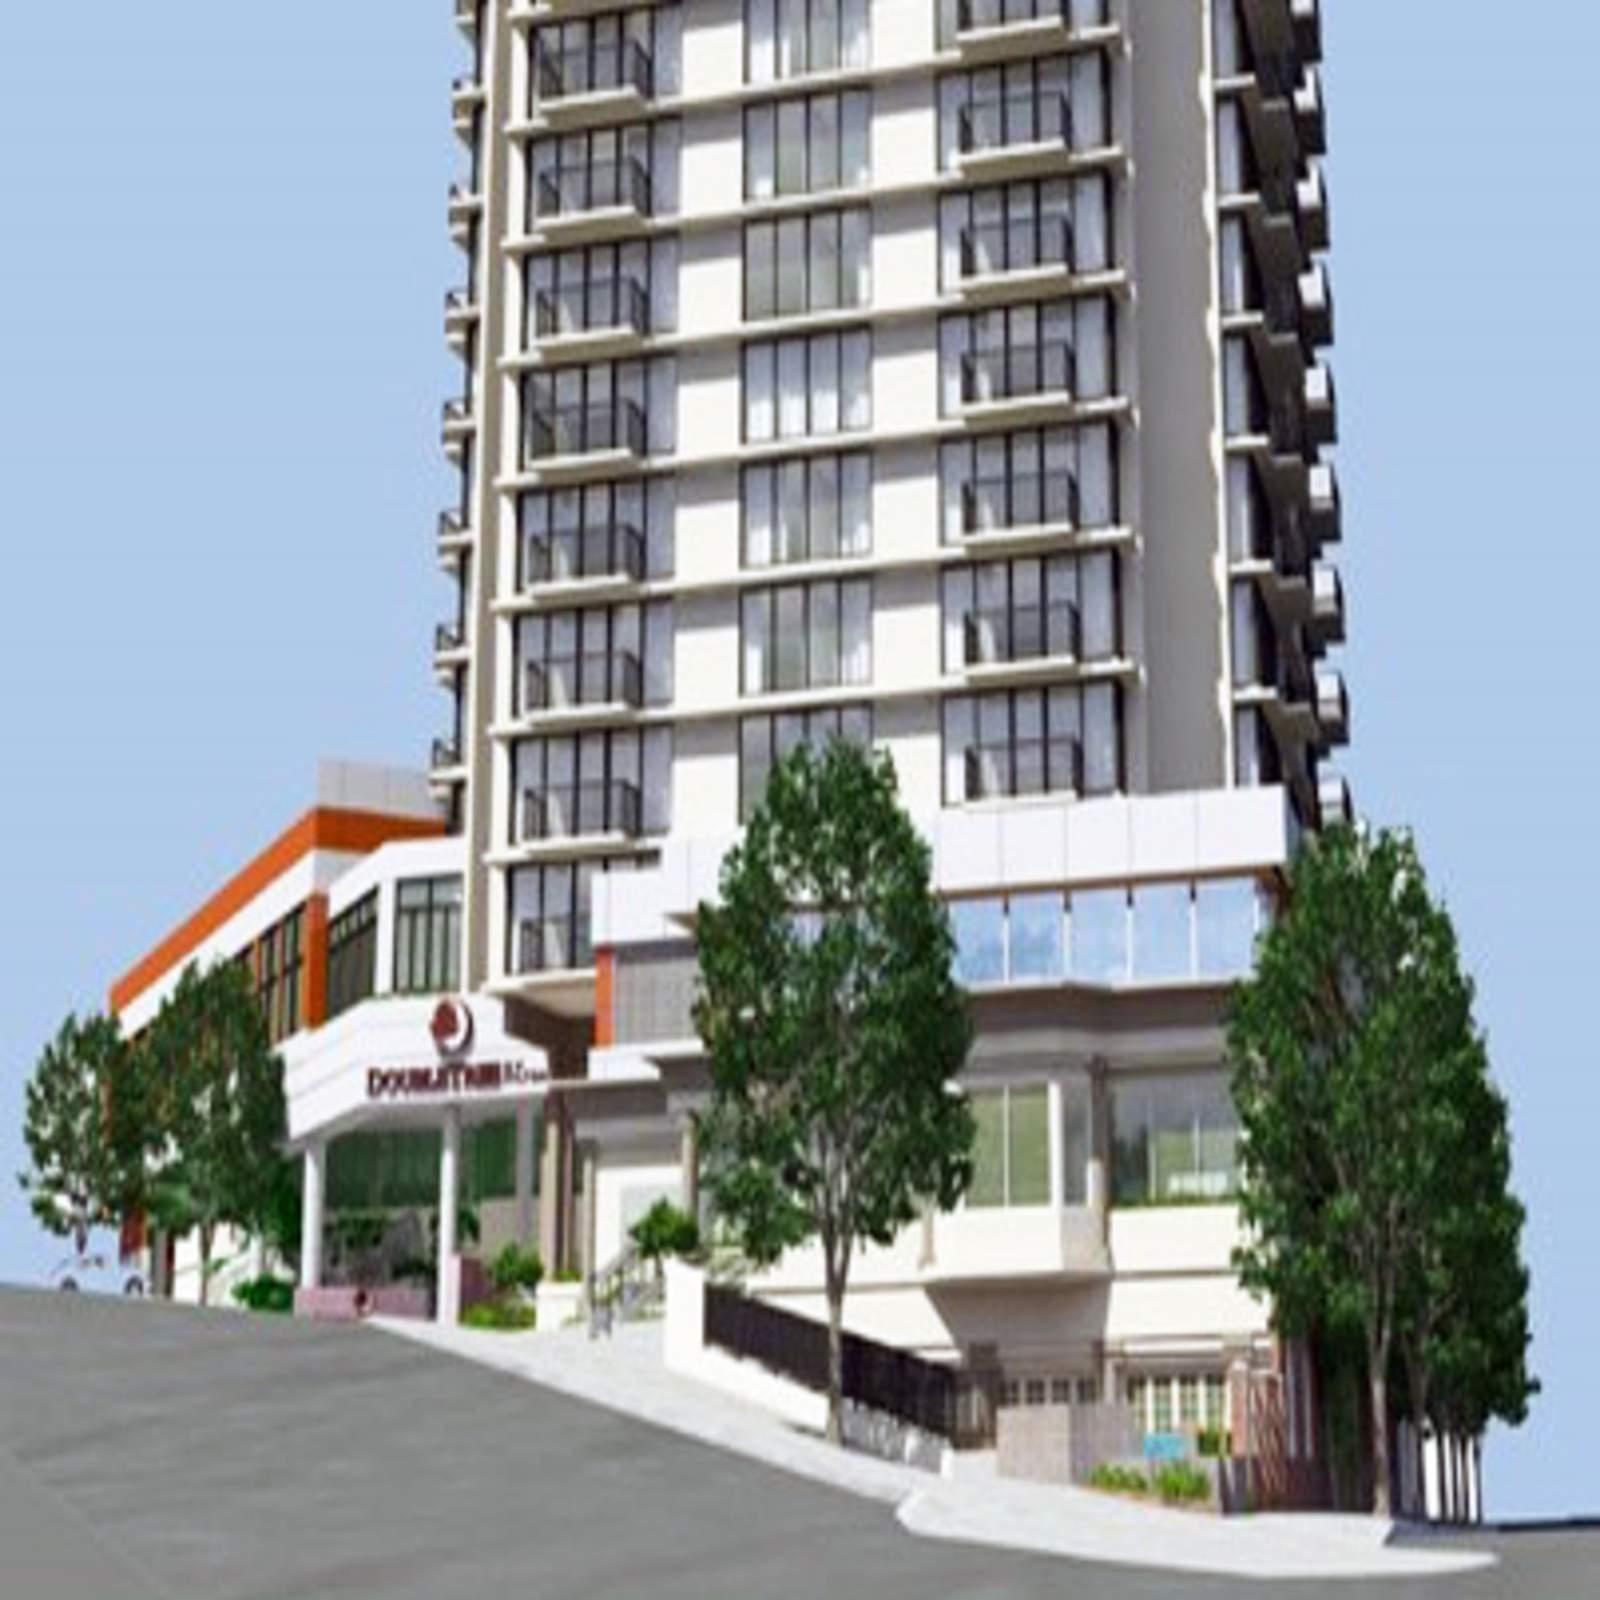 Hilton Hotels Vancouver Island